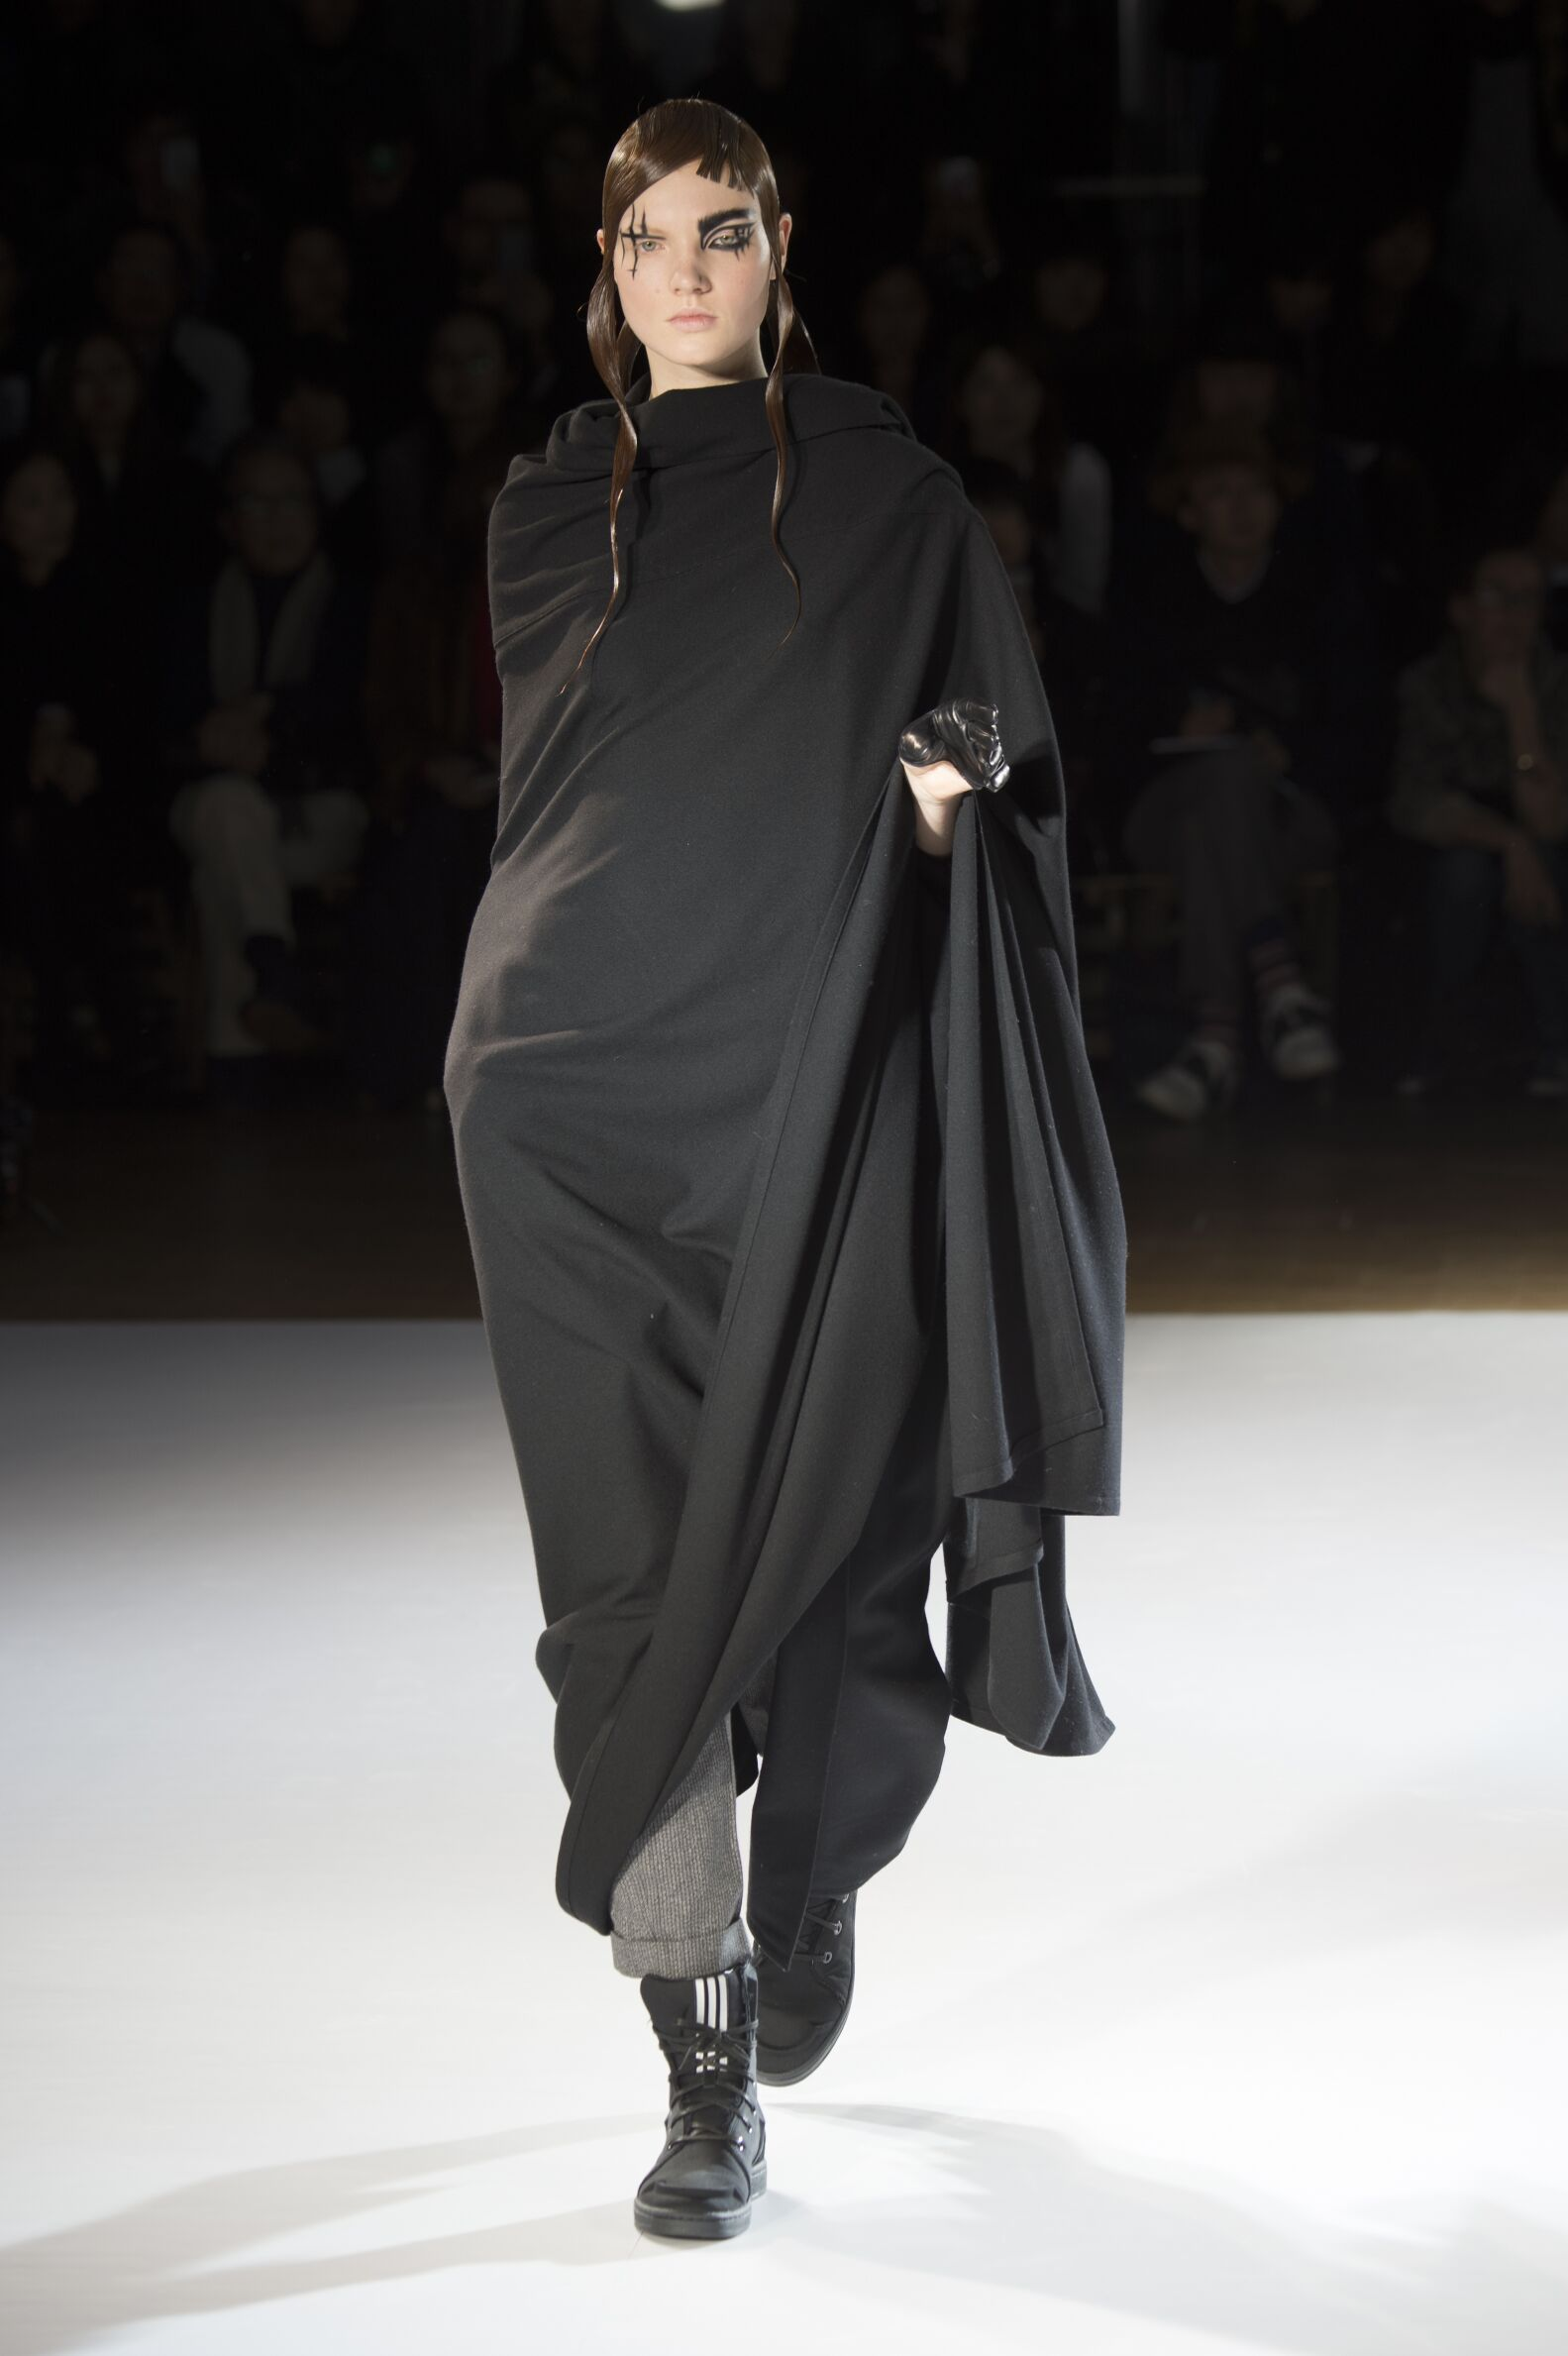 Yohji Yamamoto Collection 2015